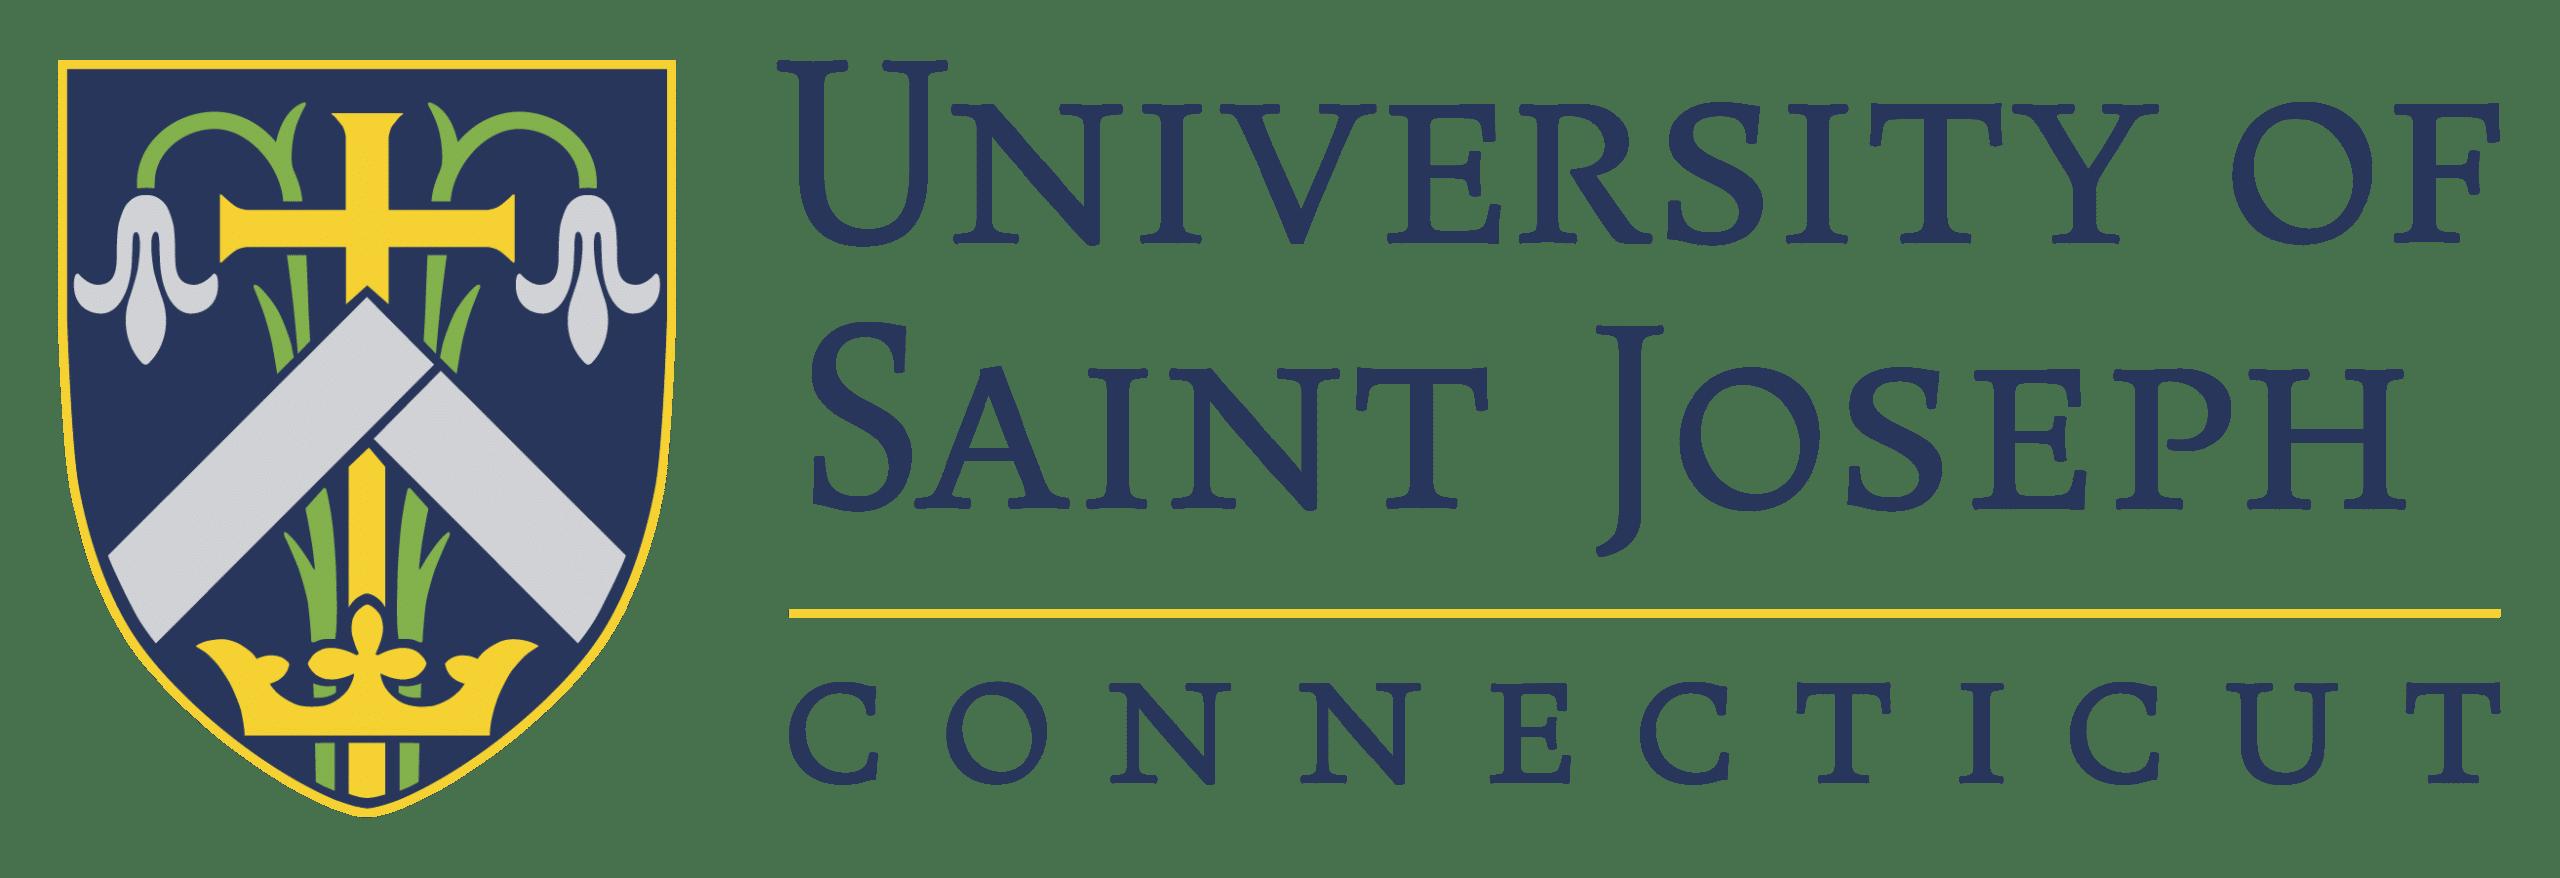 university of saint joseph connecticut logo